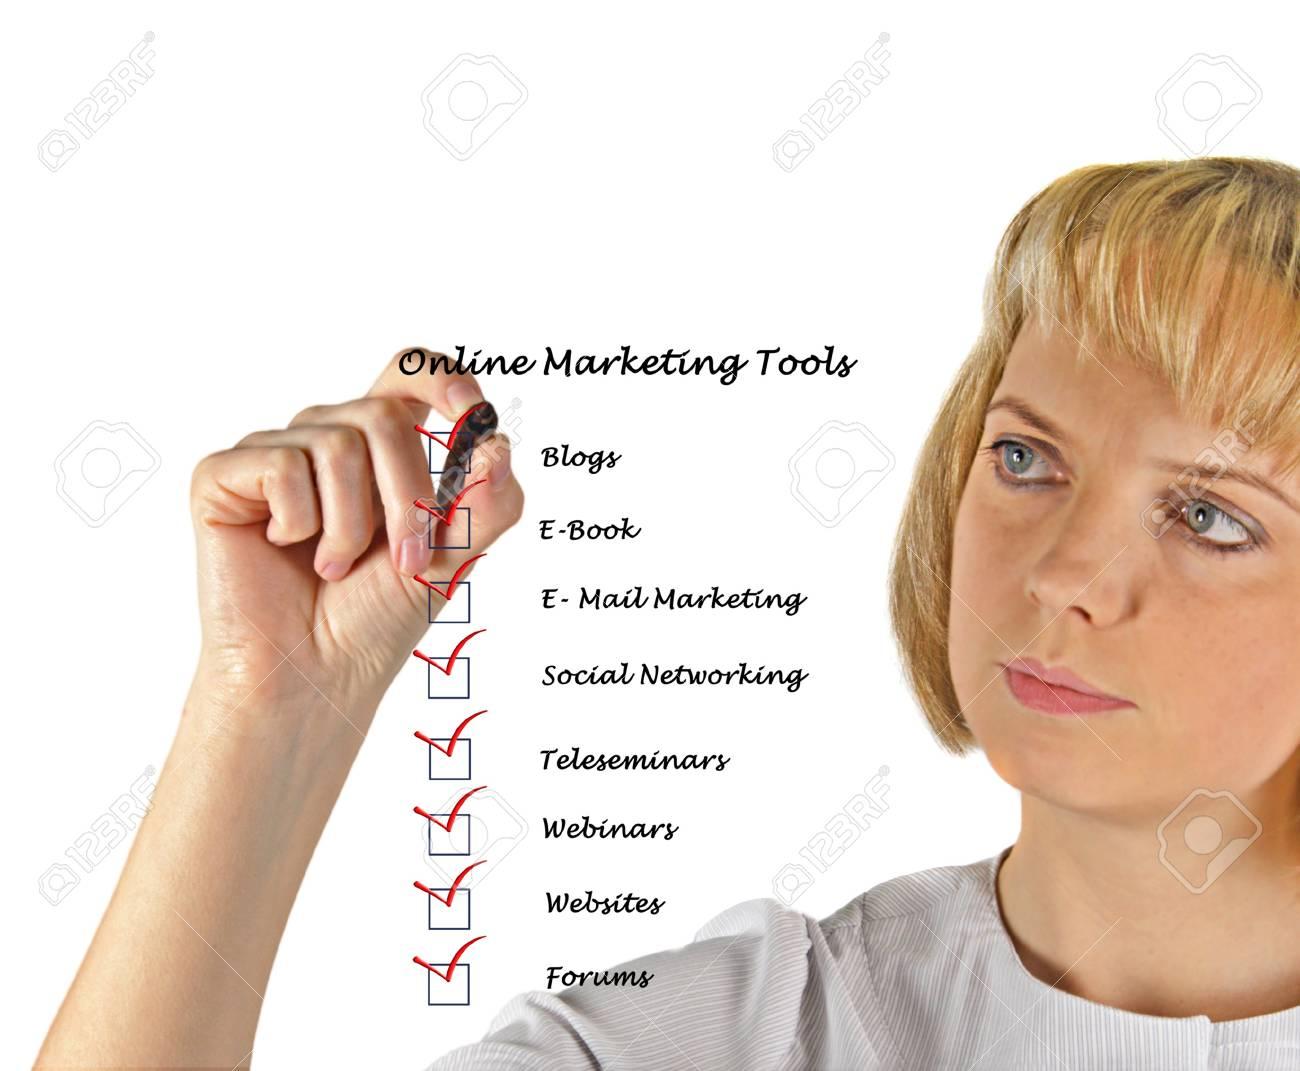 Online marketing tools Stock Photo - 13254050